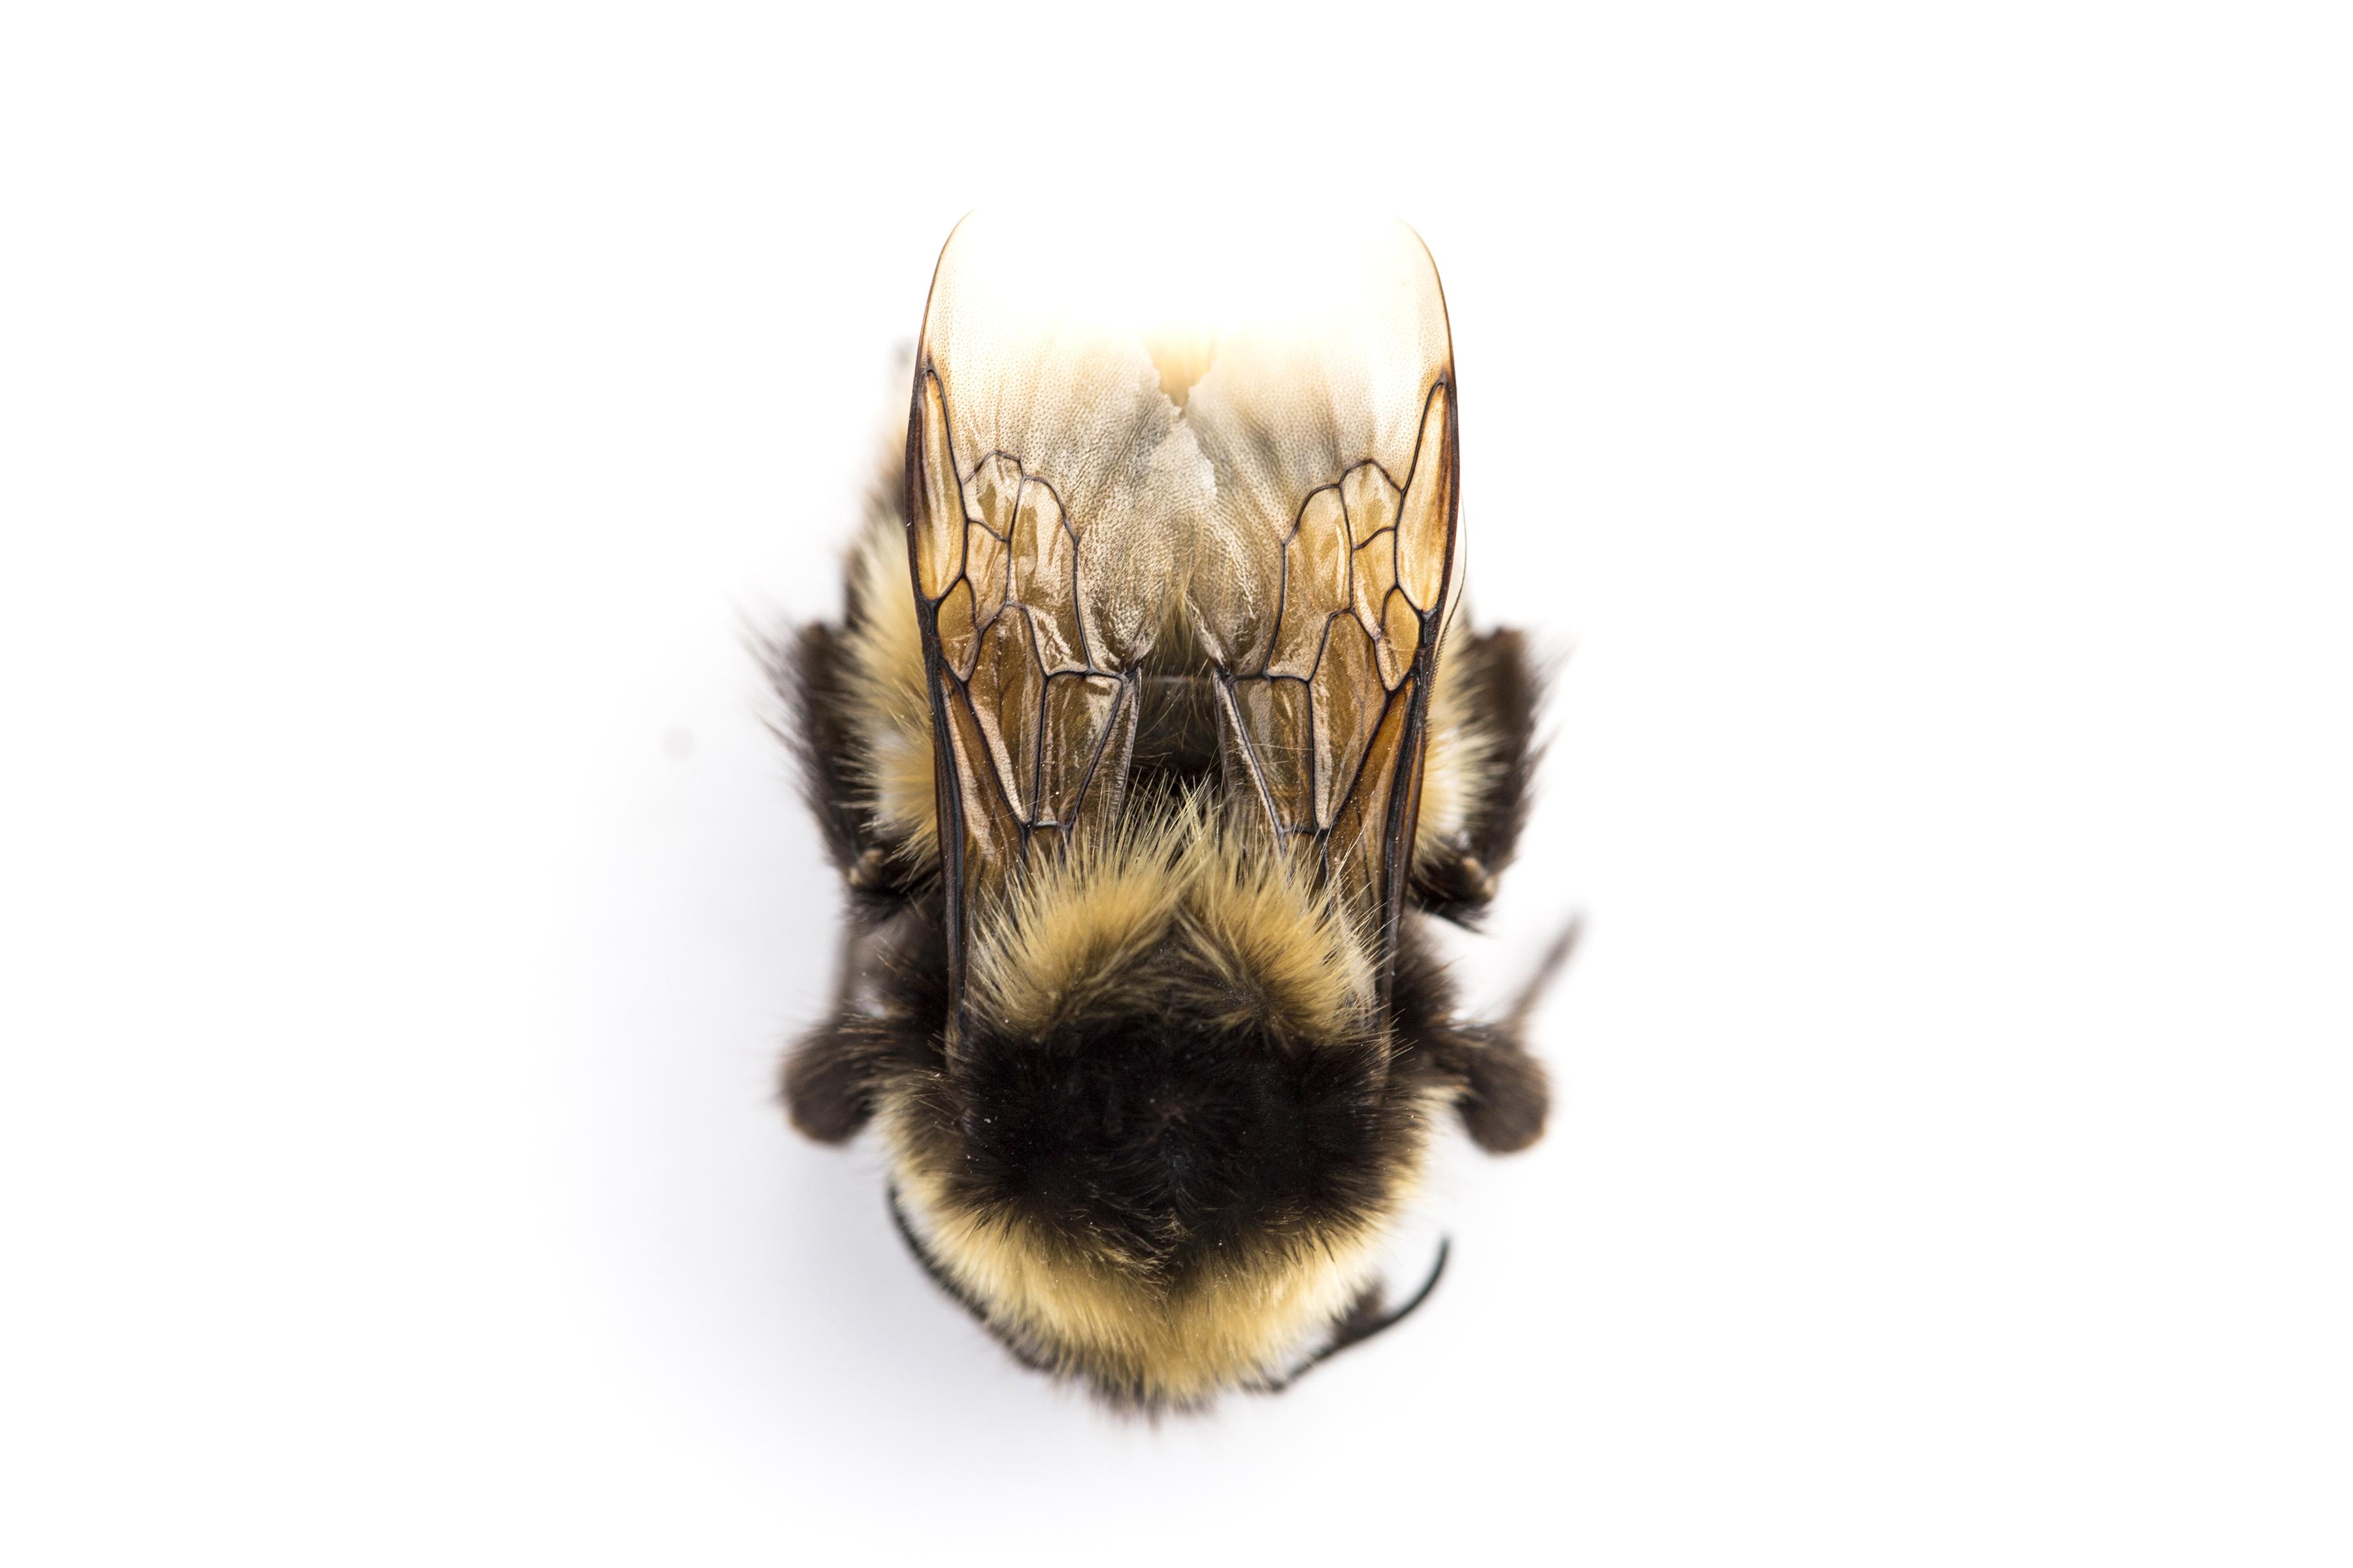 6 scientists, 1,000 miles, 1 prize: The Arctic Alaska Bumblebee